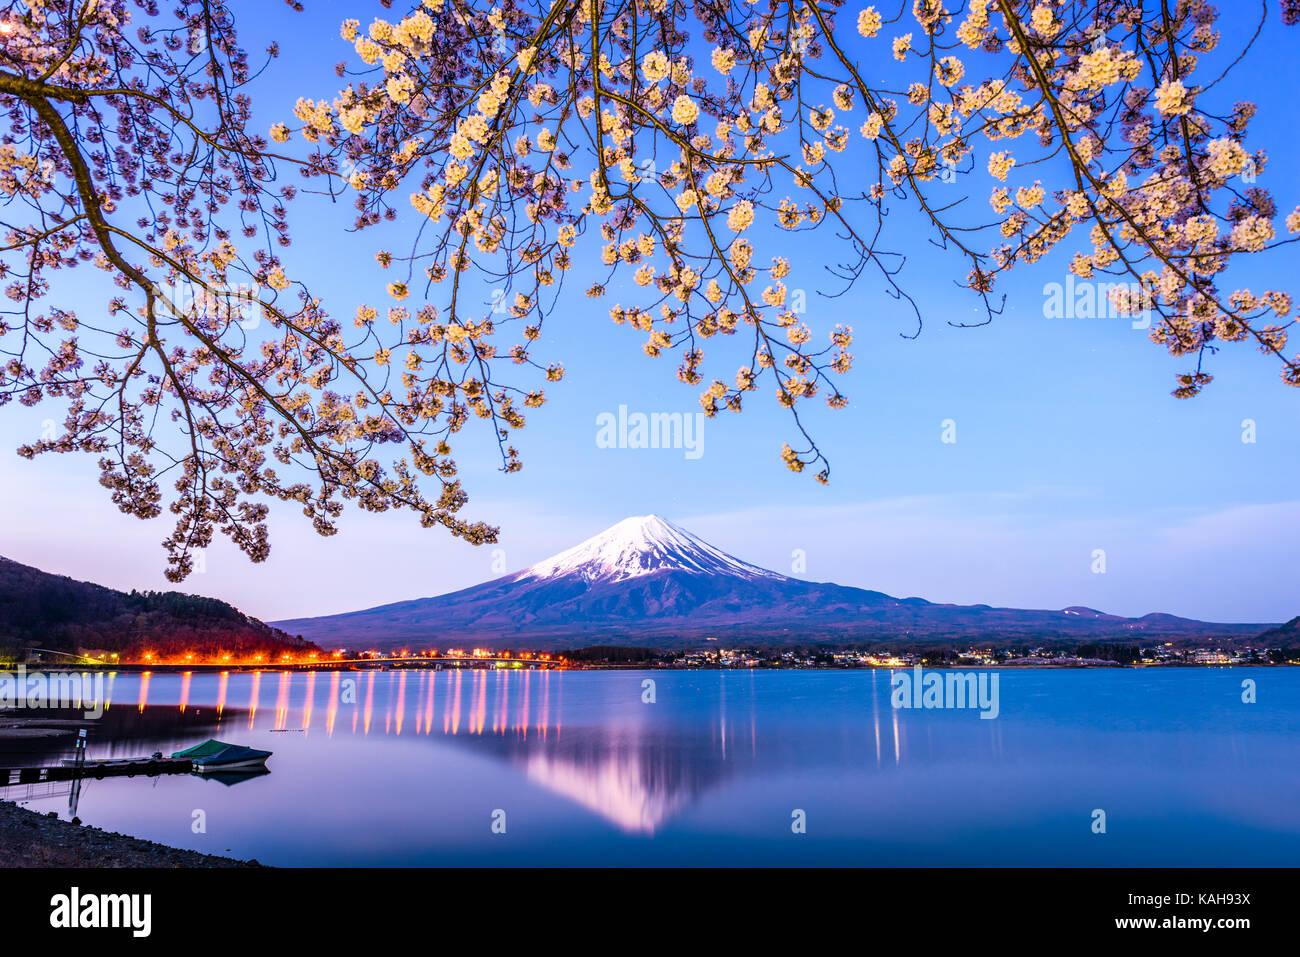 Mt. Fuji on Lake Kawaguchi, Japan during spring season. - Stock Image